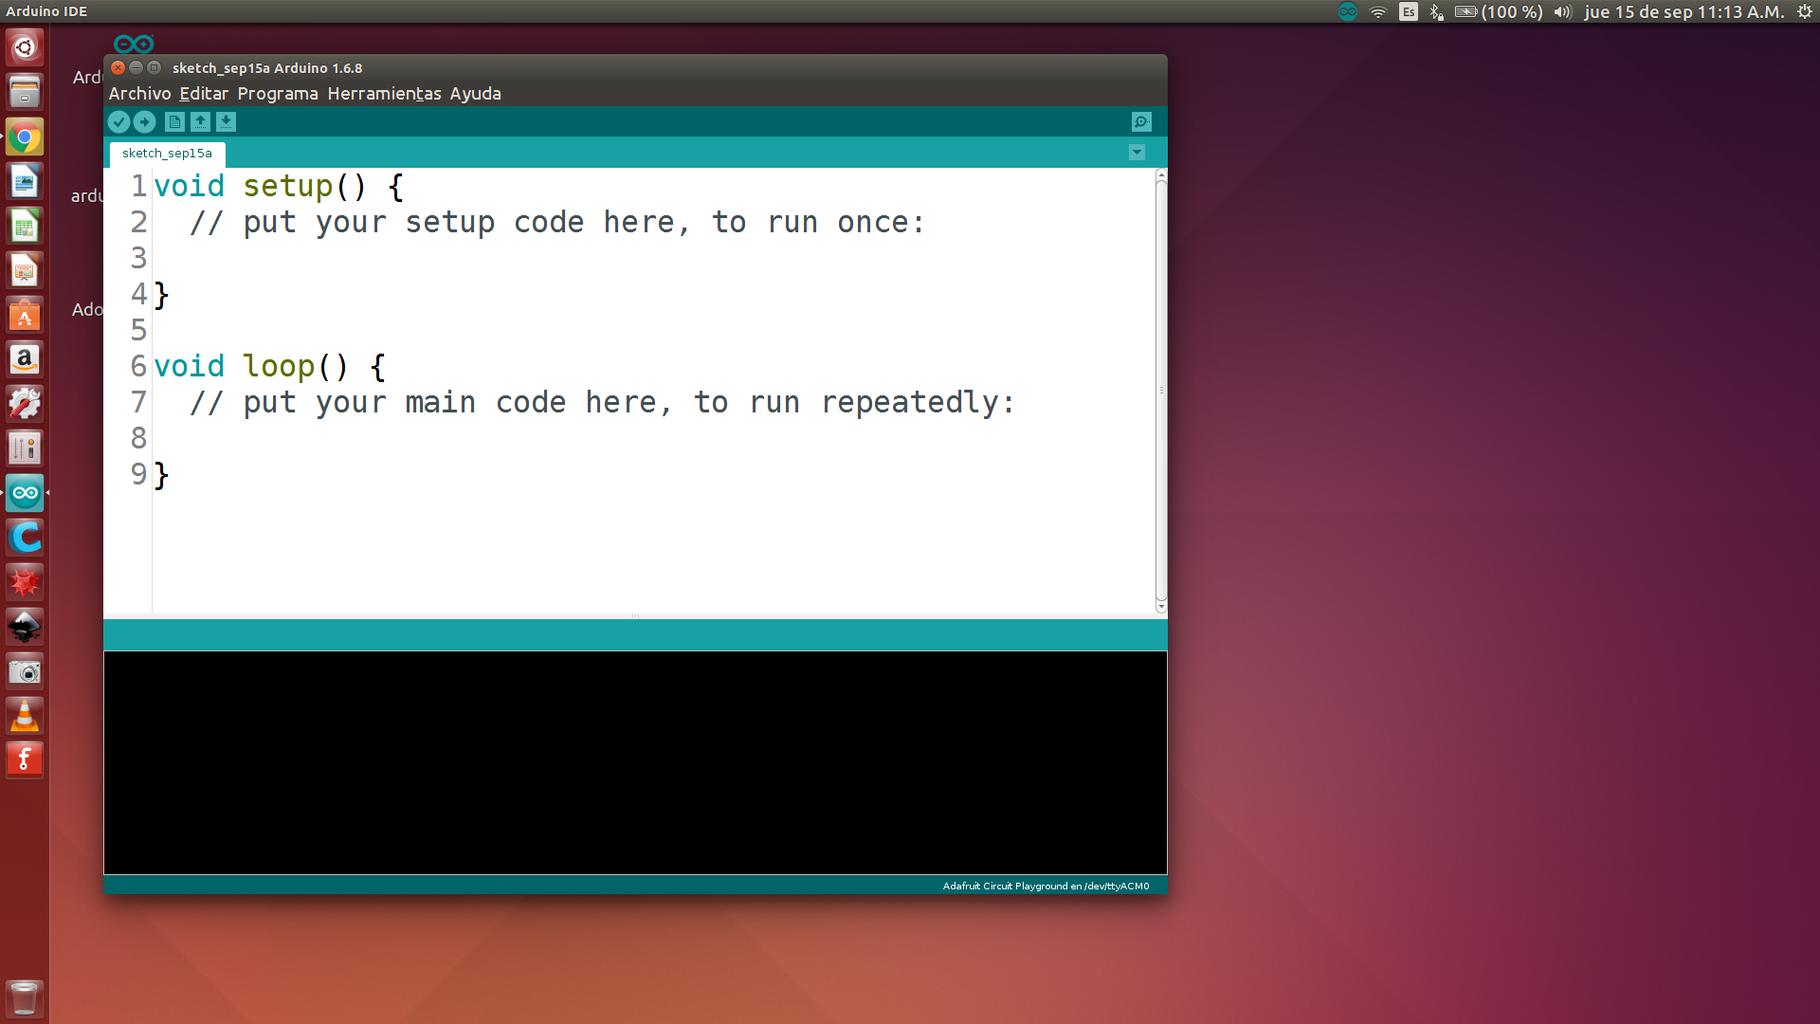 Abrir Arduino IDE